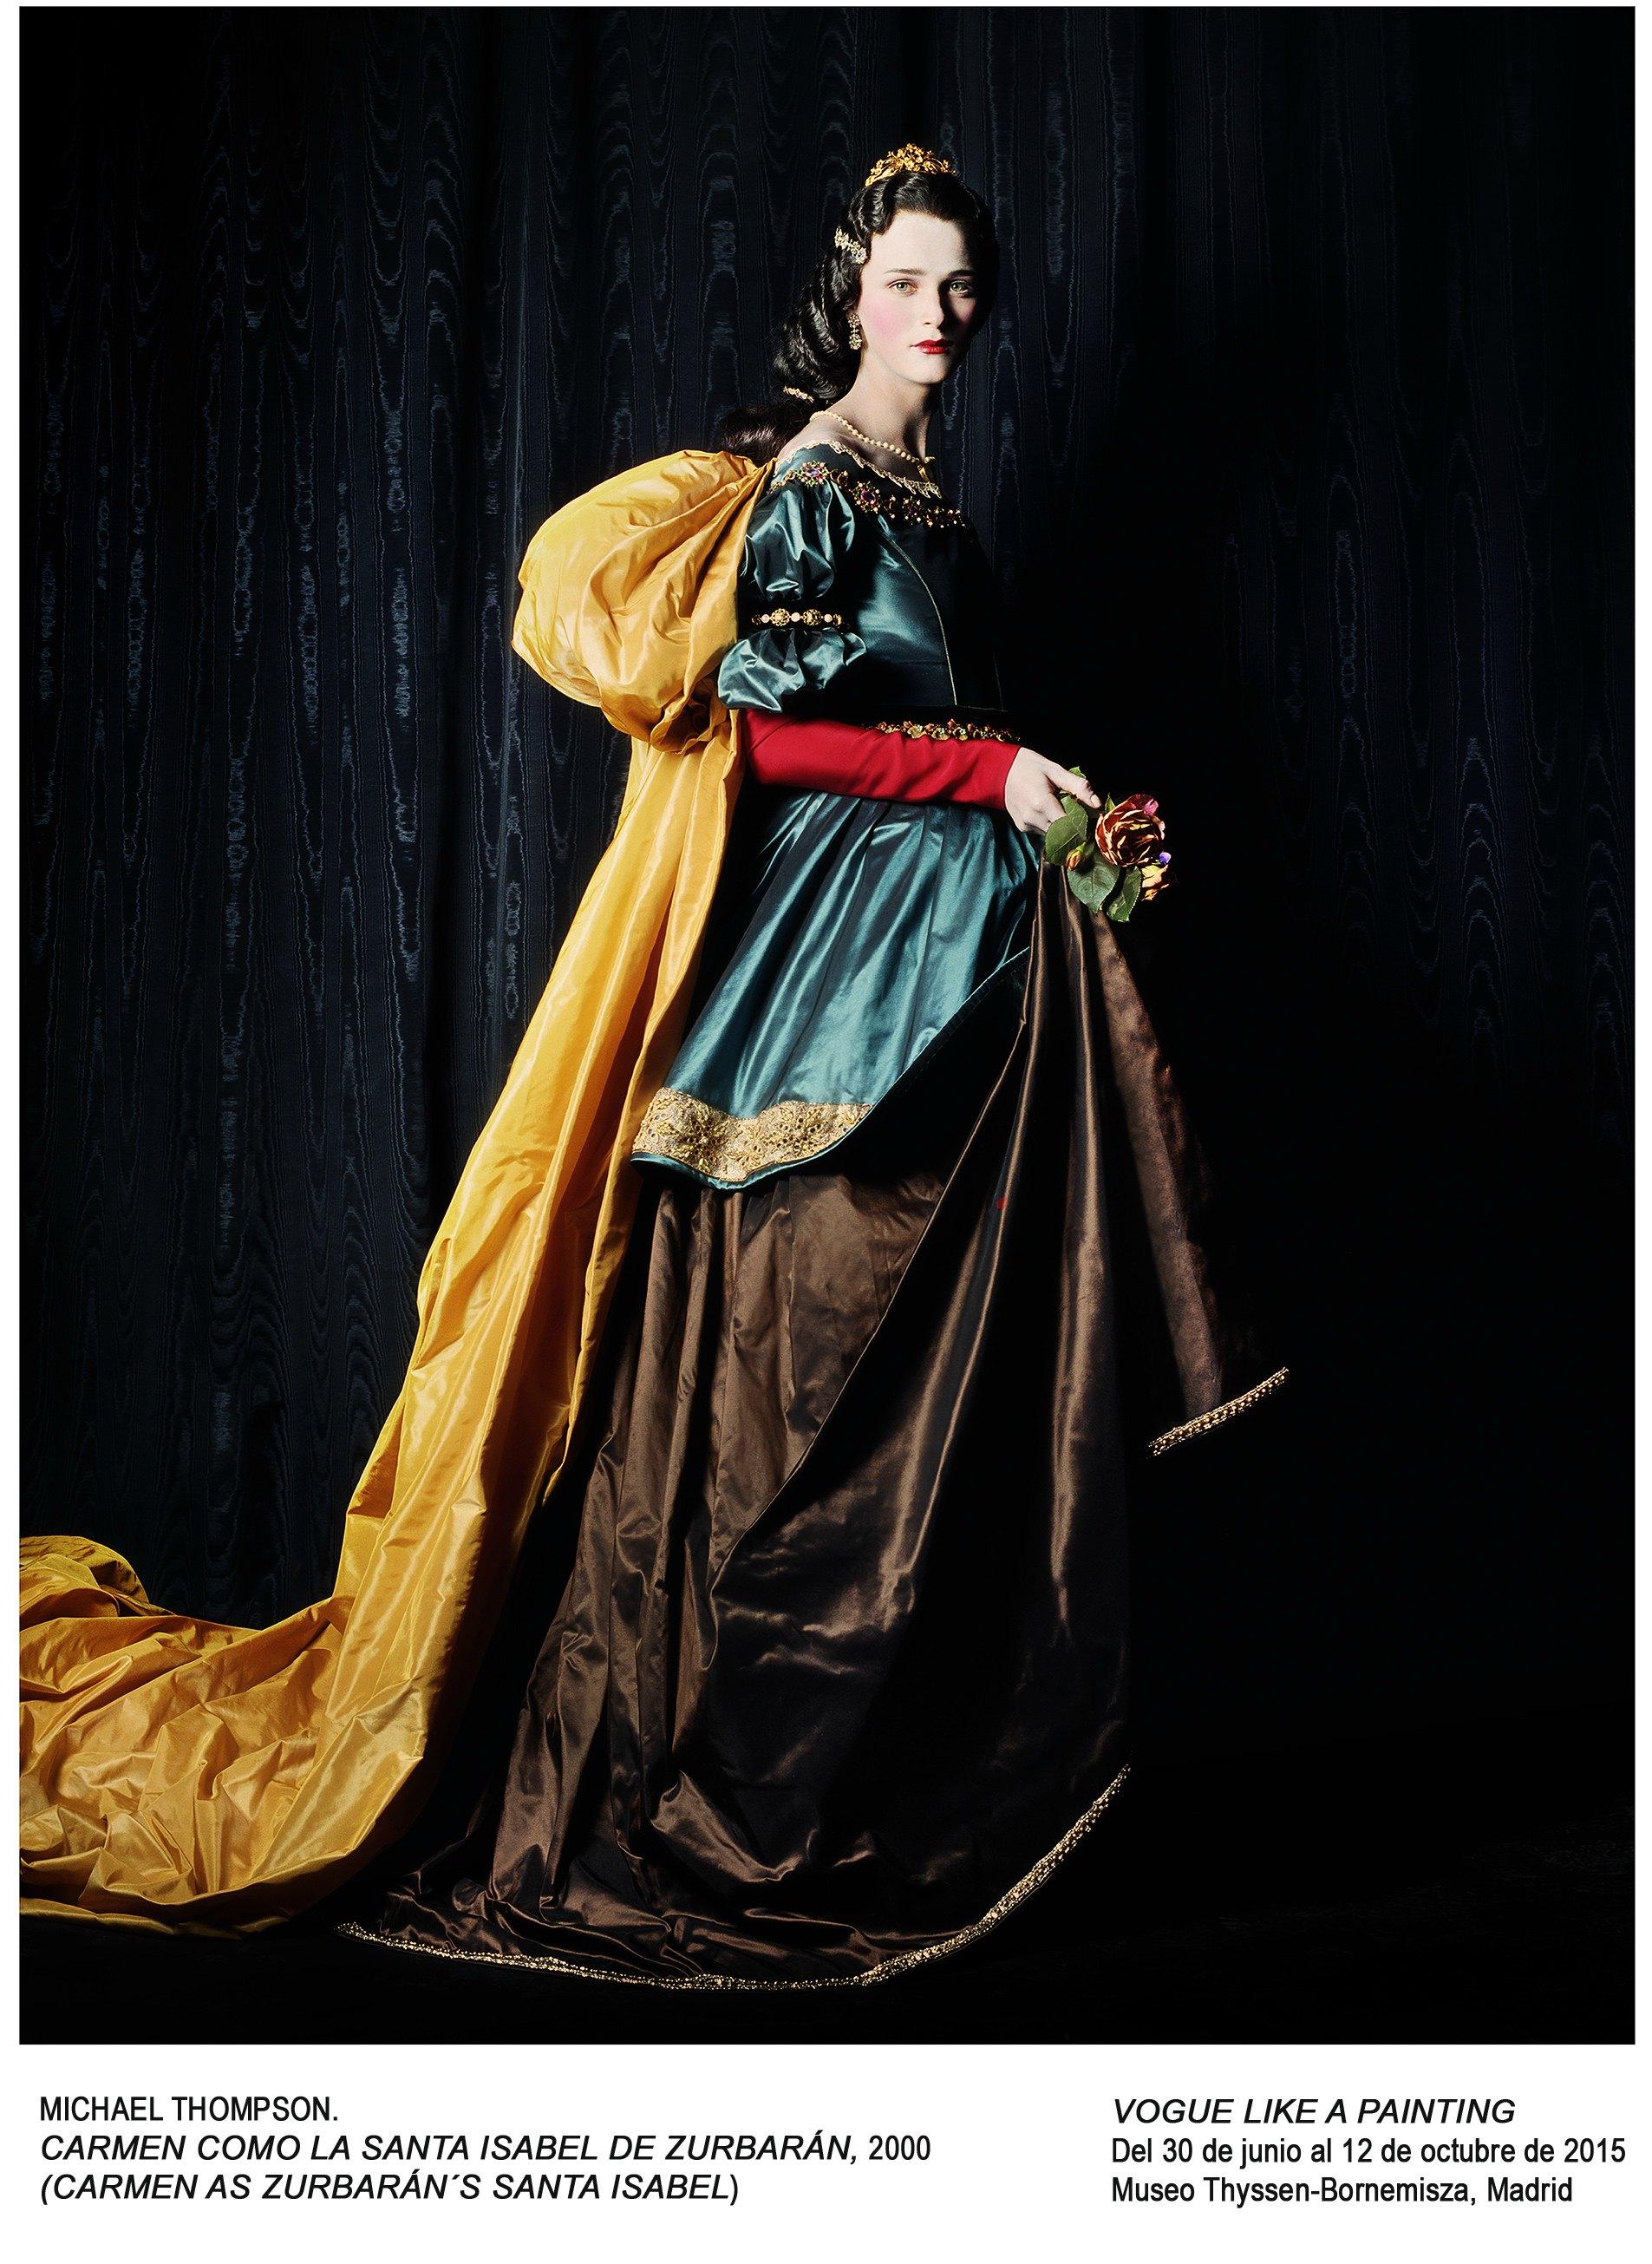 'Vogue like a painting' en el Thyssen-Bornemisza